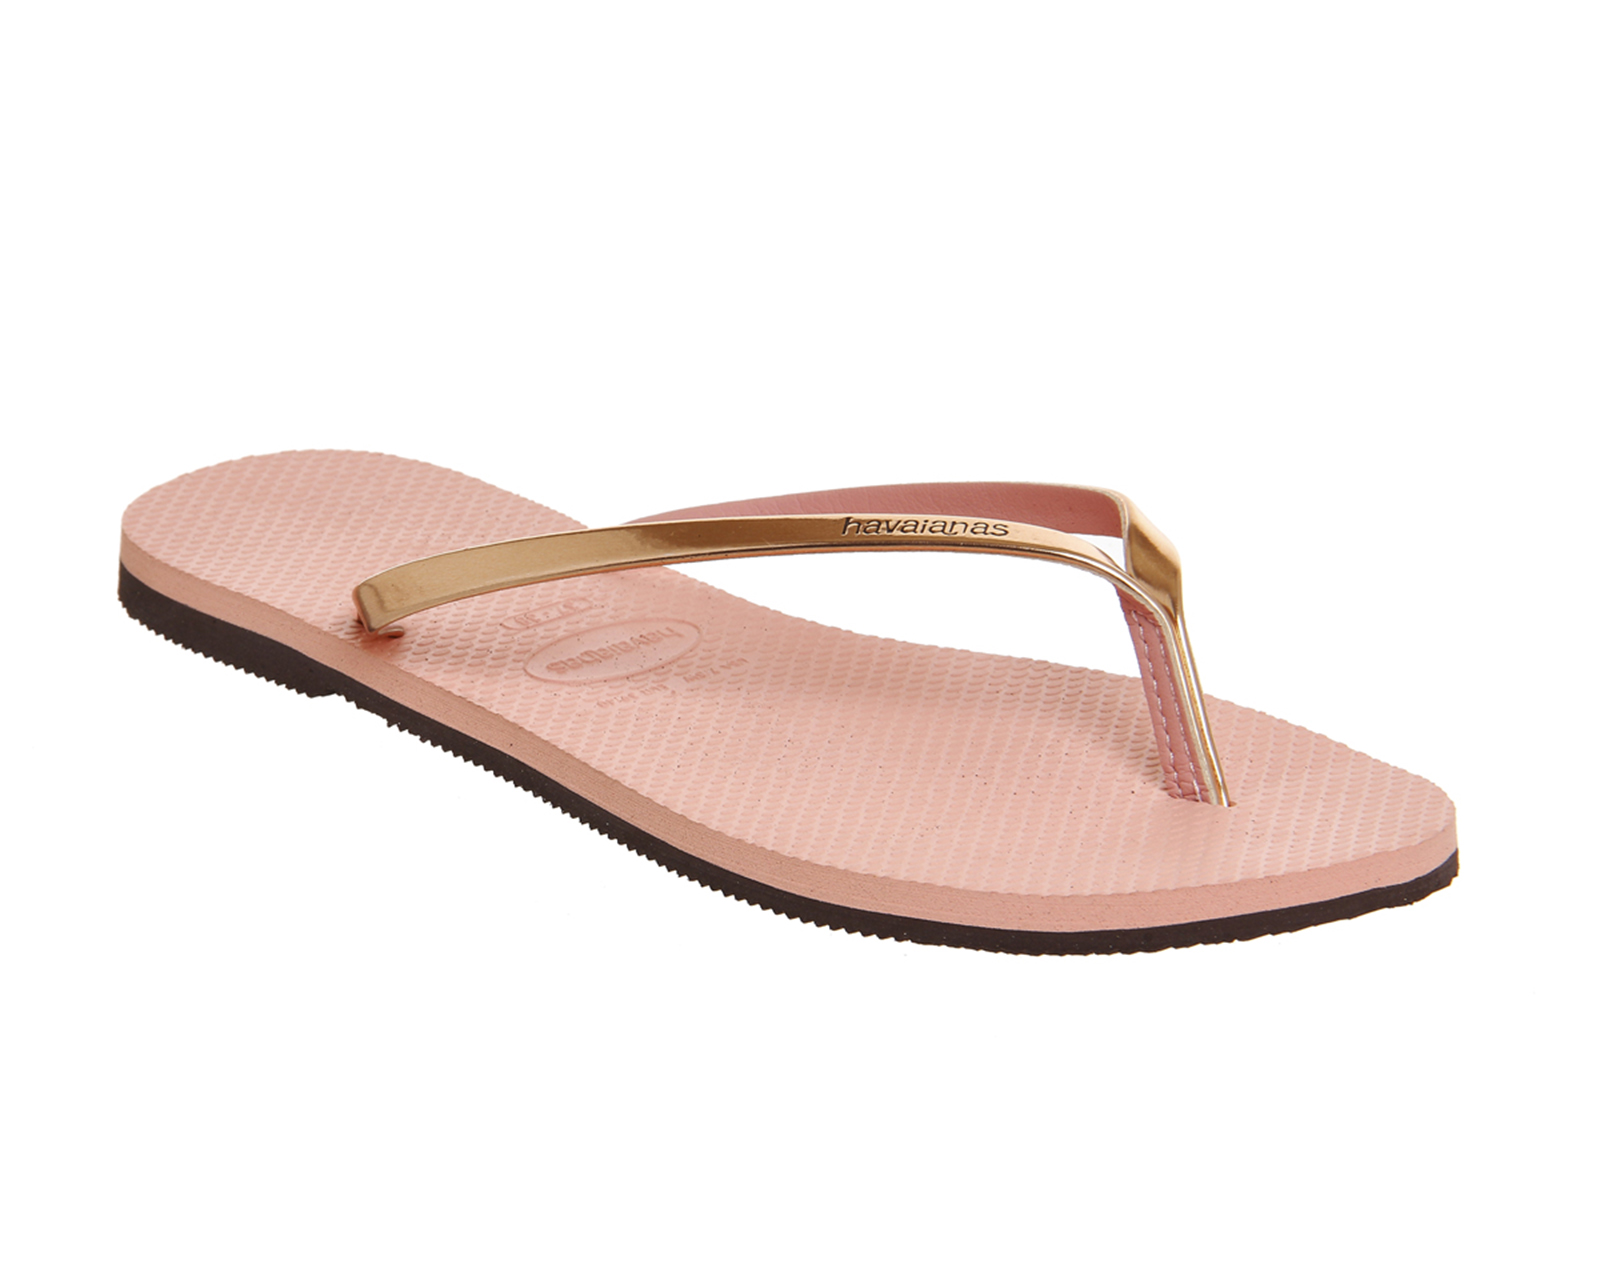 womens havaianas slim you metallic flip flop light pink sandals ebay. Black Bedroom Furniture Sets. Home Design Ideas